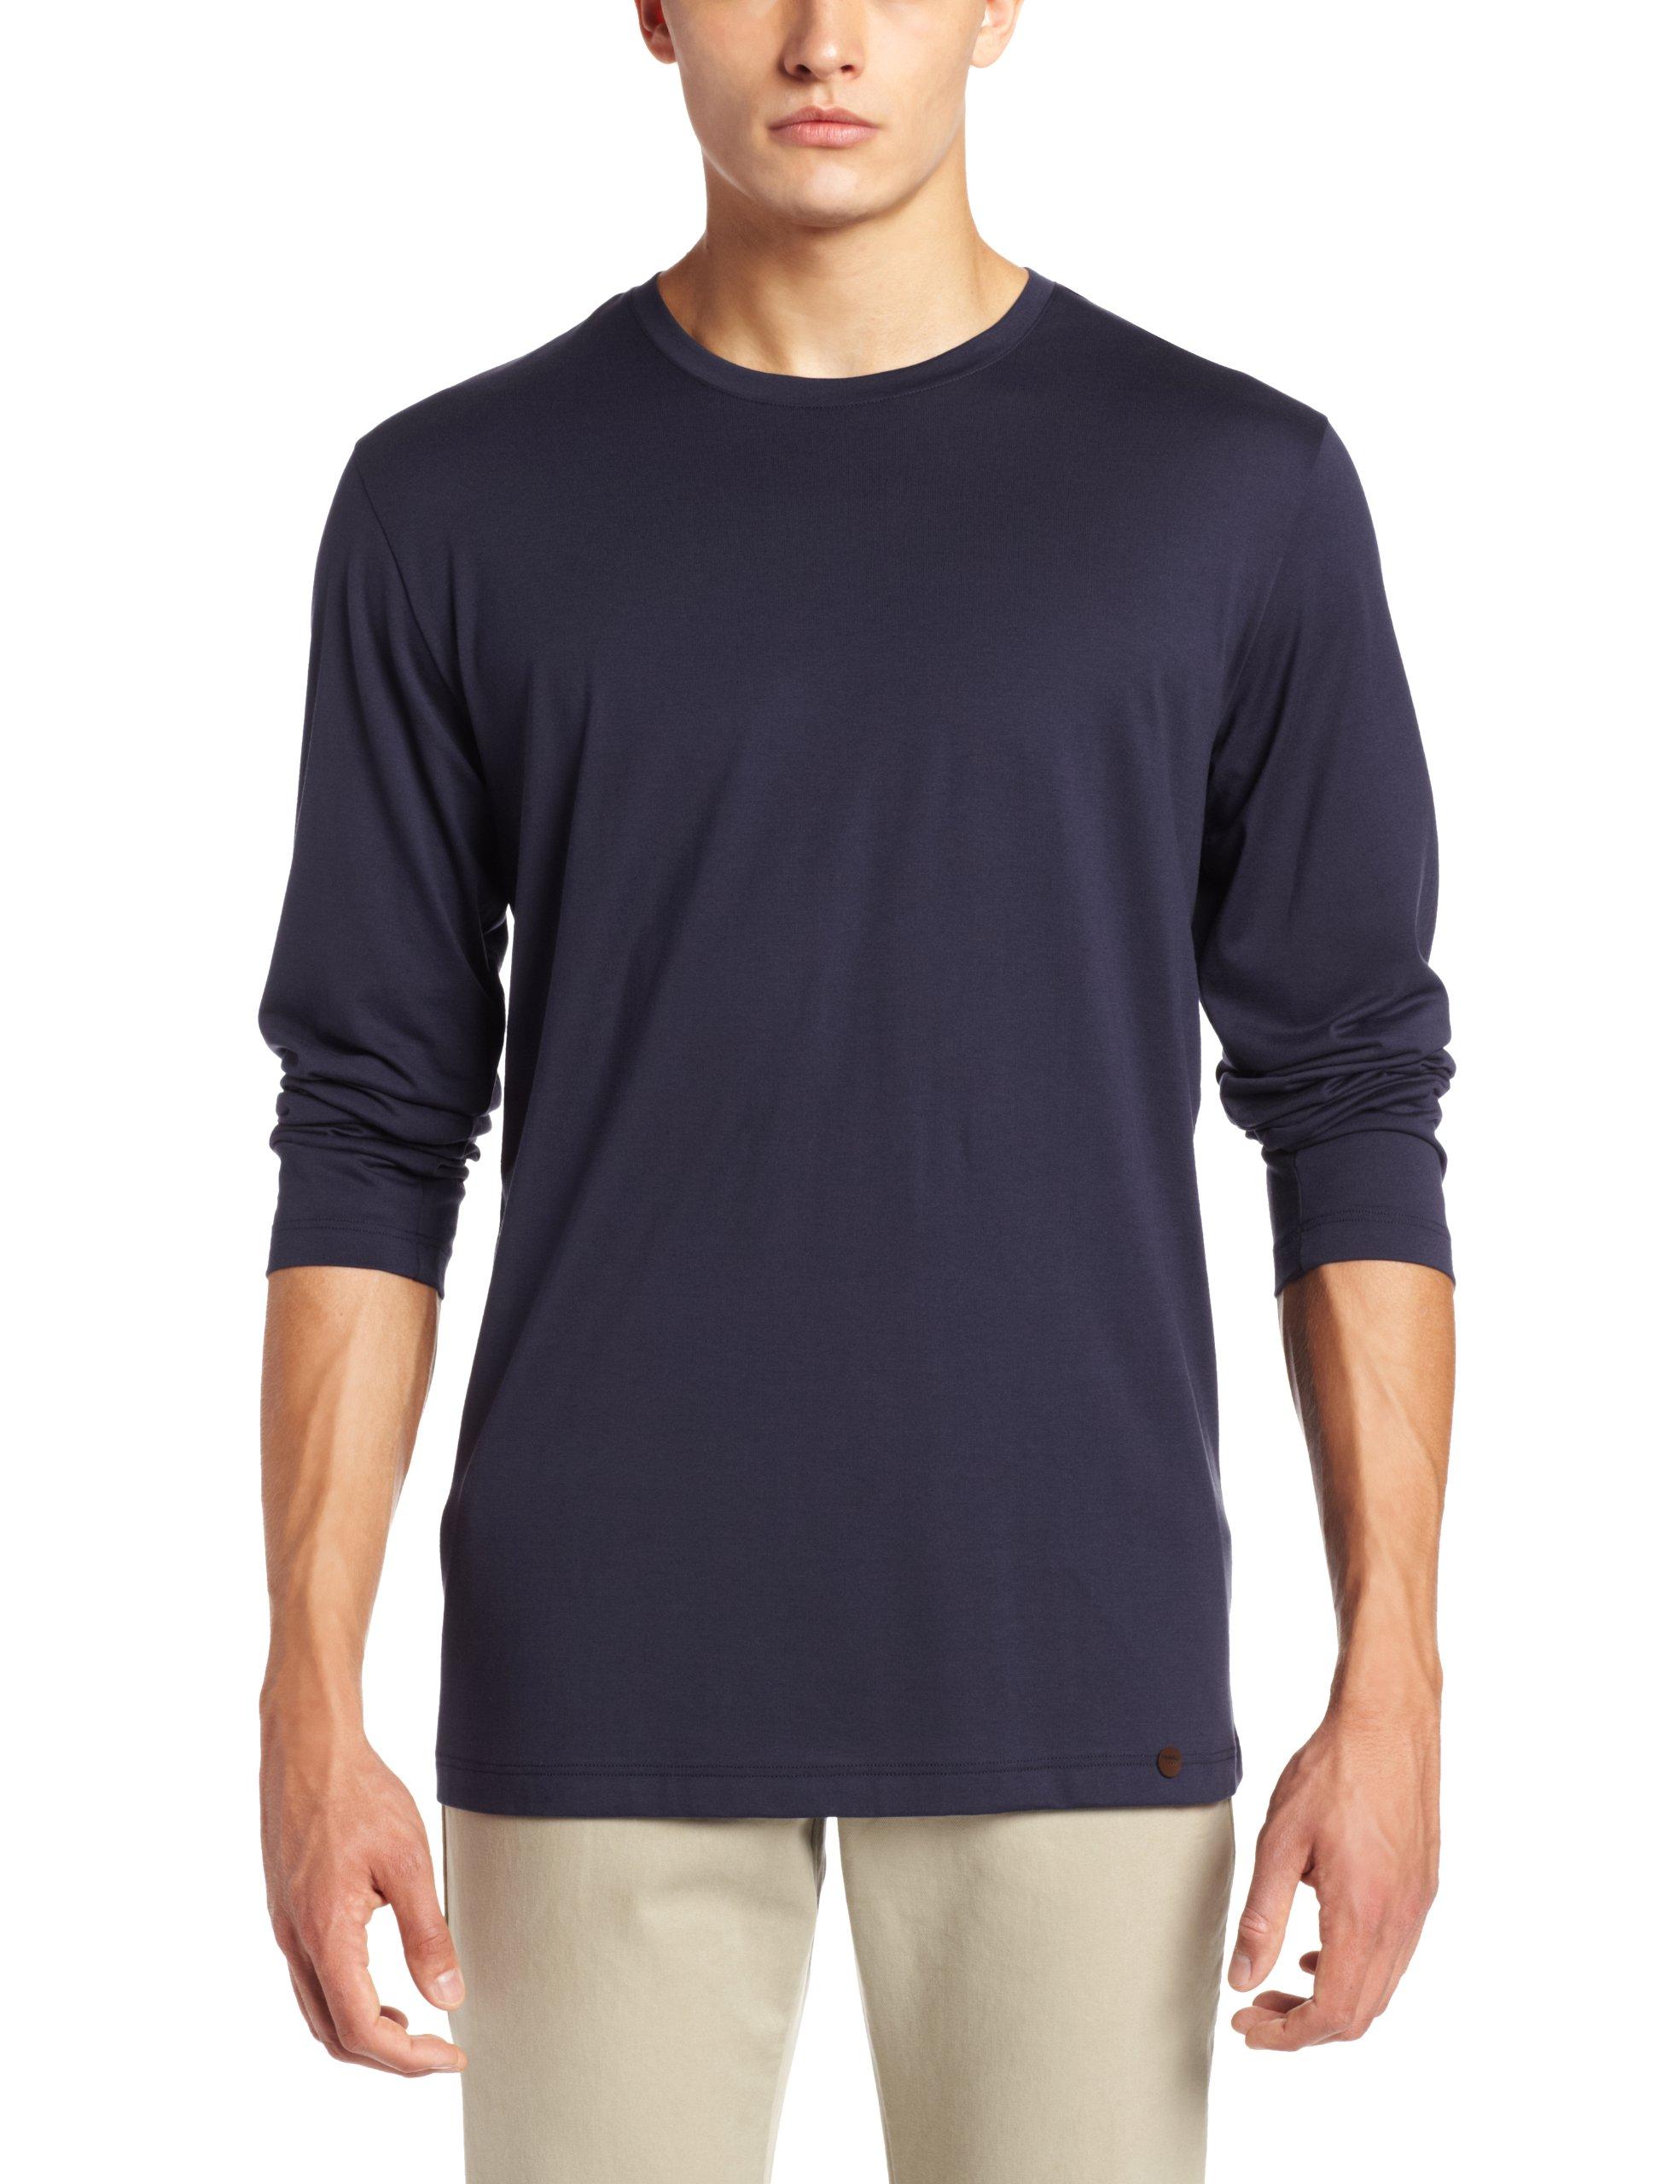 Noirblack De Pyjama largetaille FabricantXxlHomme Shirt 1 Iris 0496Xx 1 Arm Hanro Haut dorCxeBQW